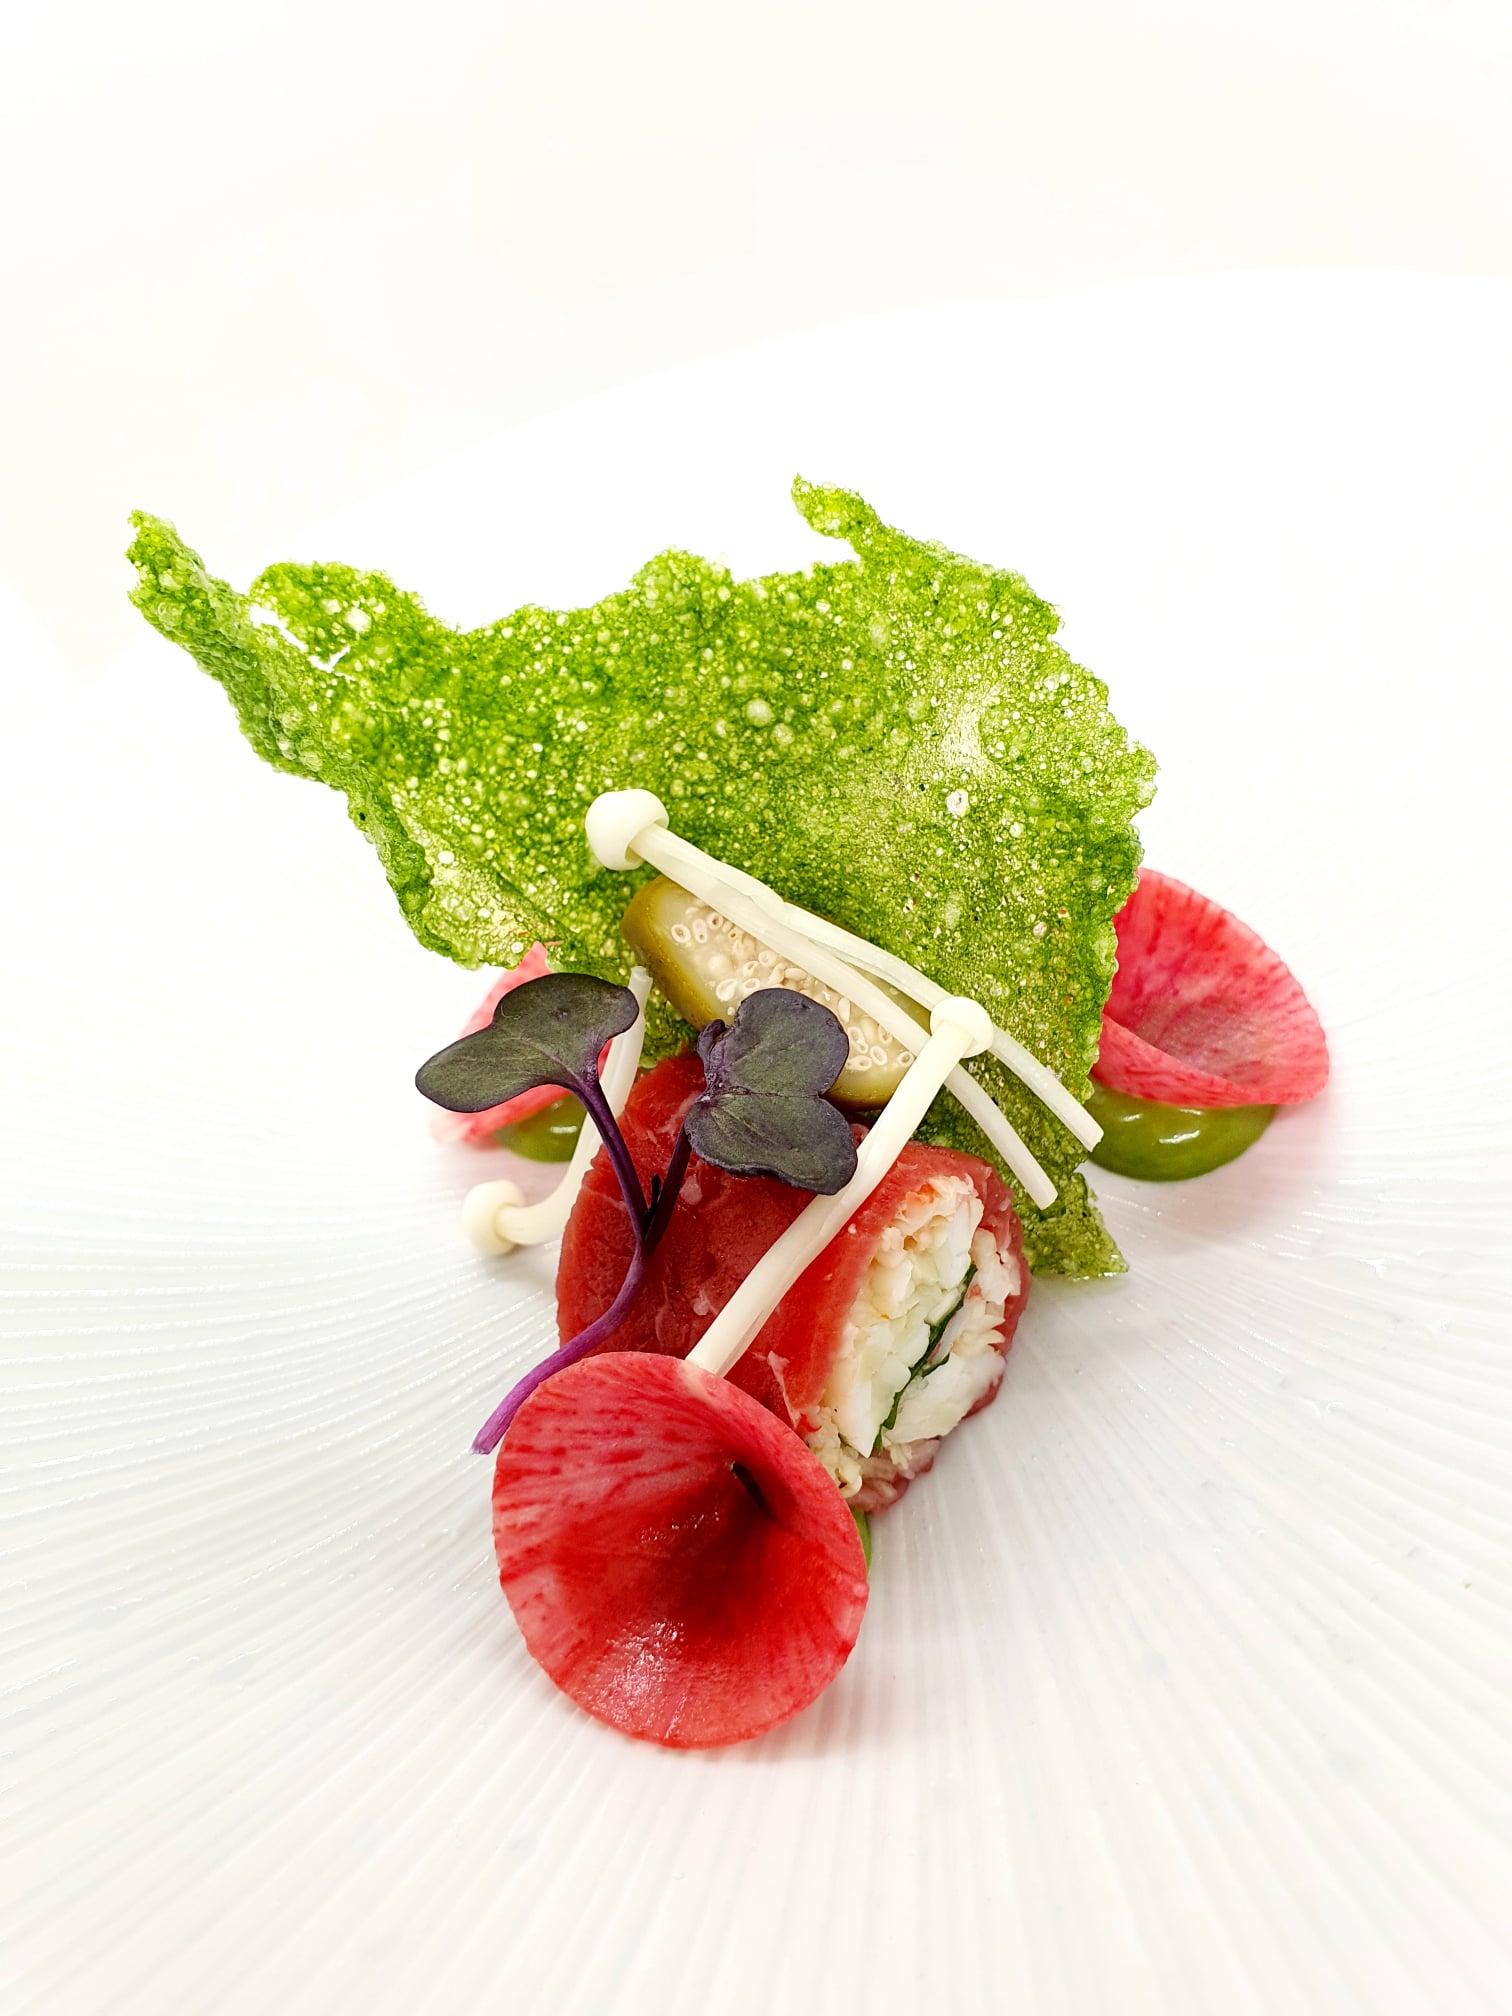 Wallonie : 13 restaurants où commander un menu de Saint-Valentin canon - 12